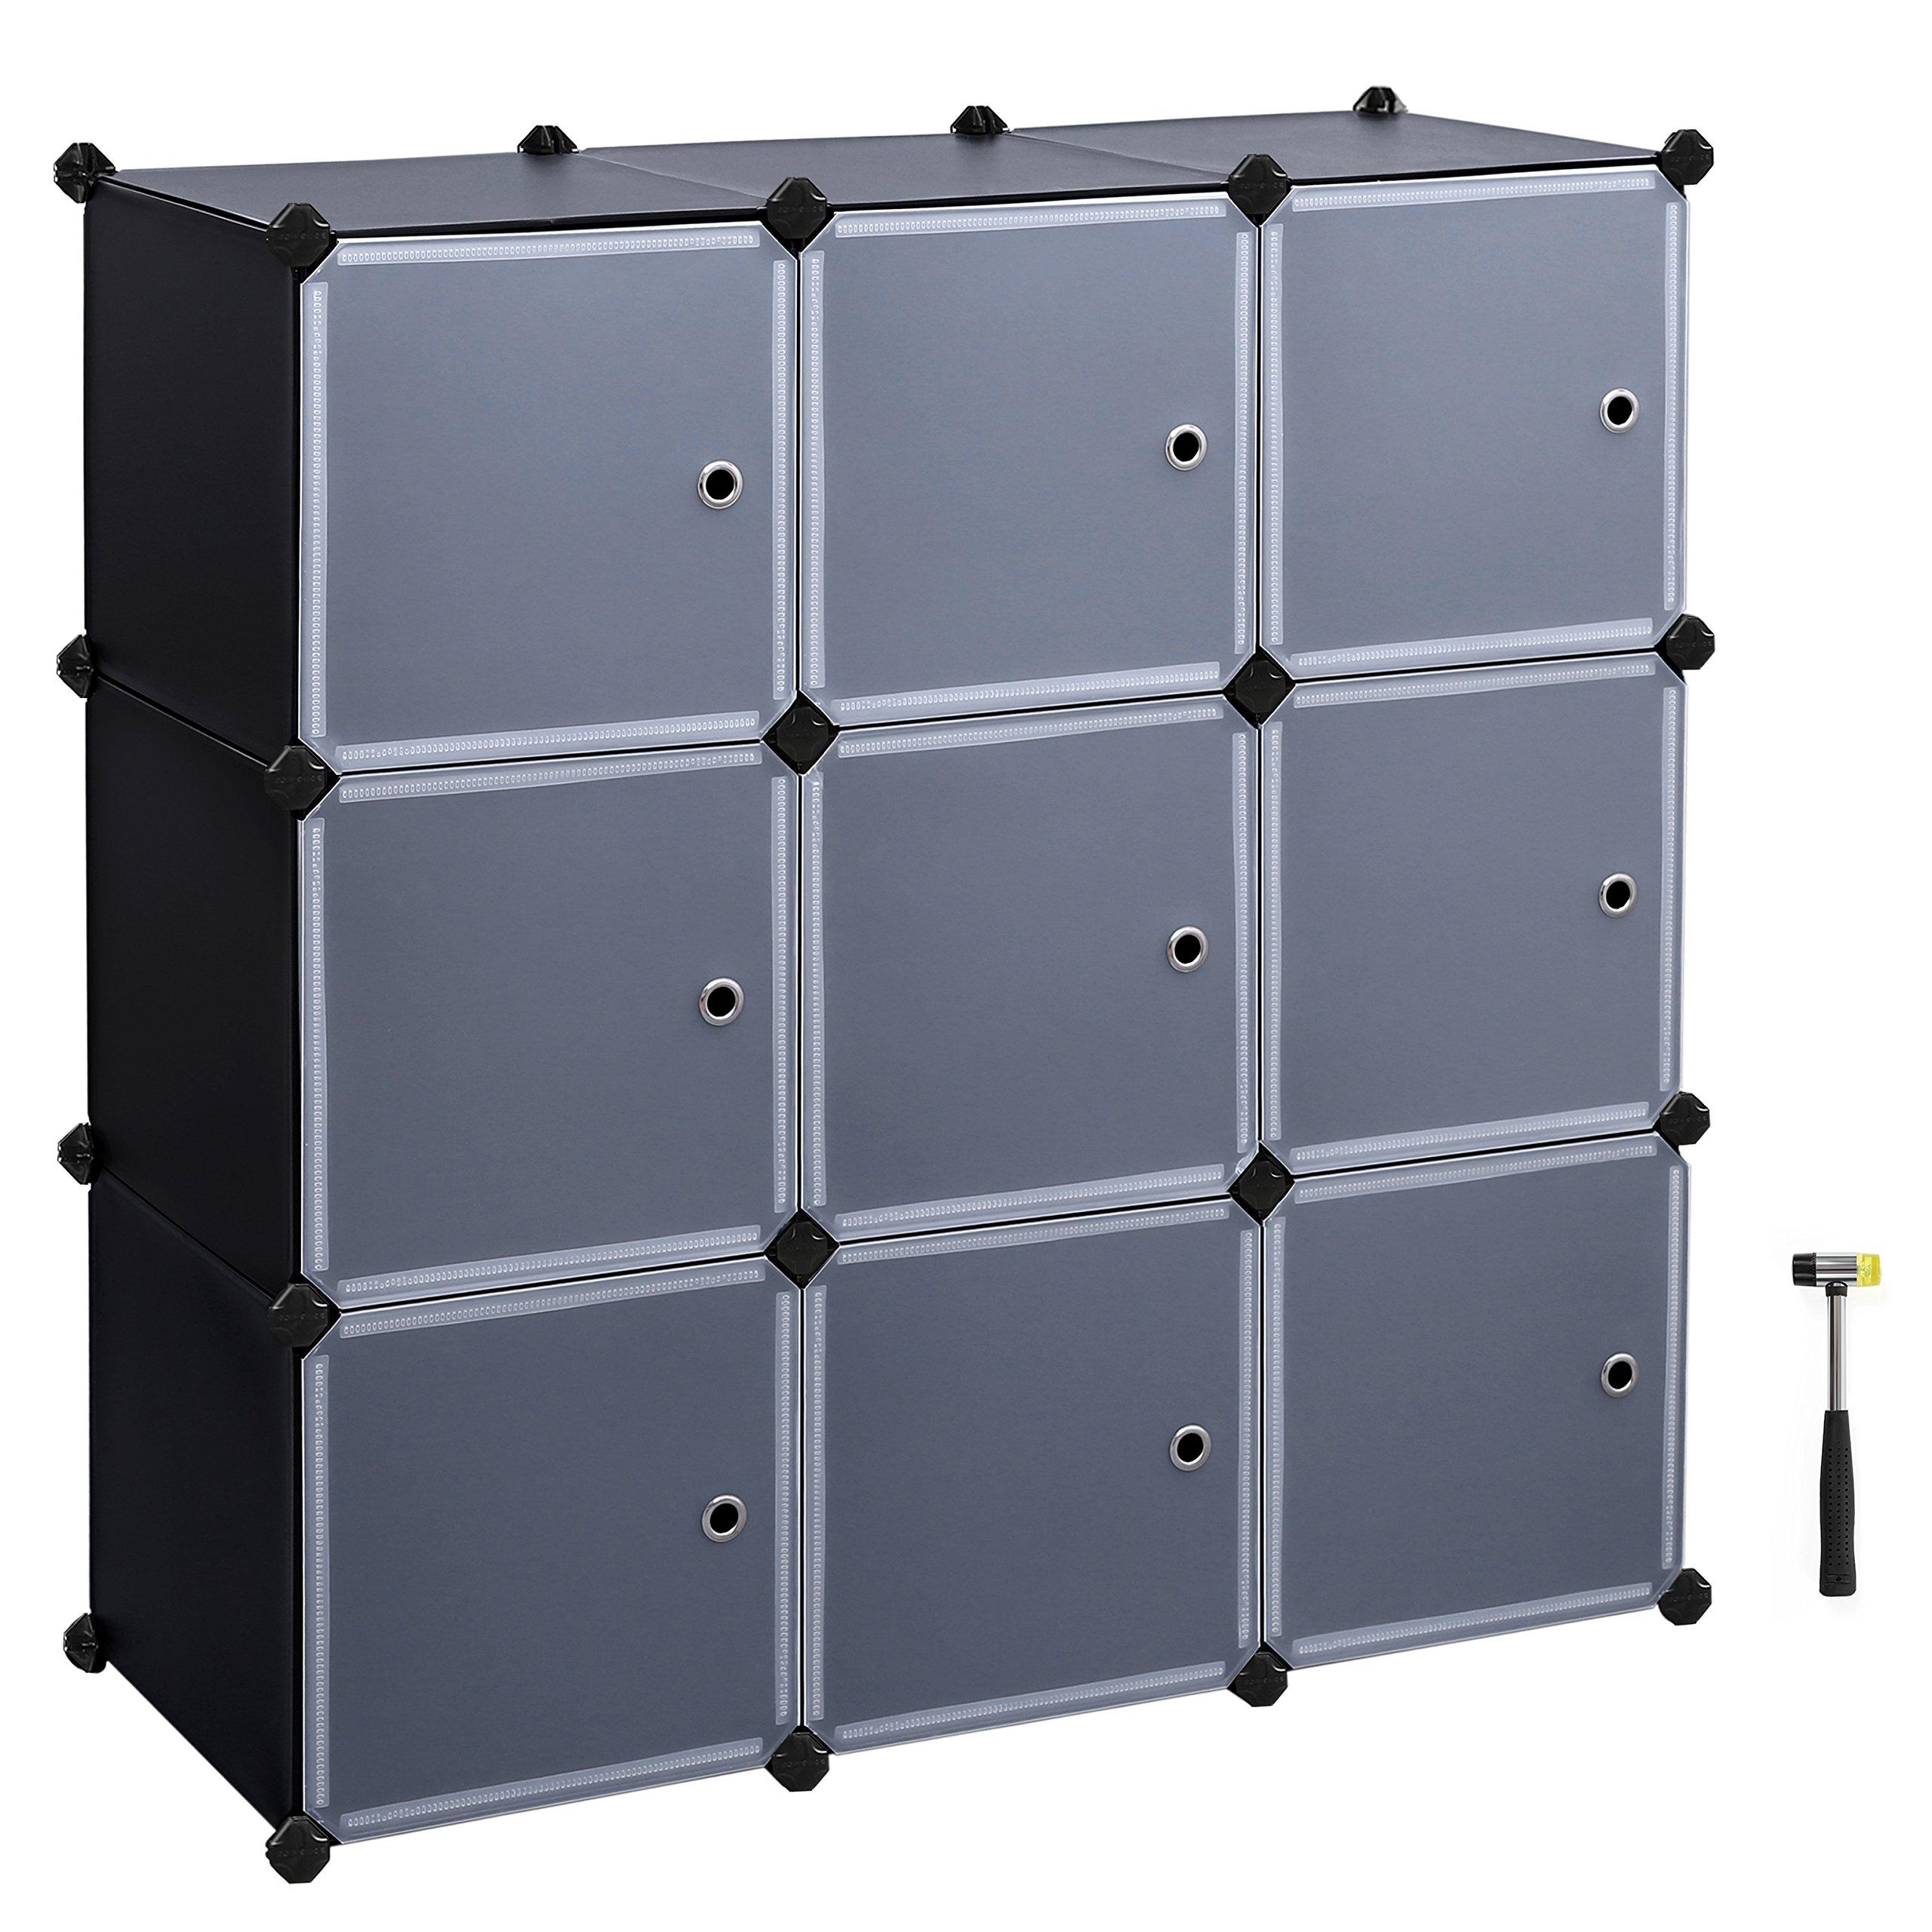 Metal Storage Cube Organizer: Amazon.com